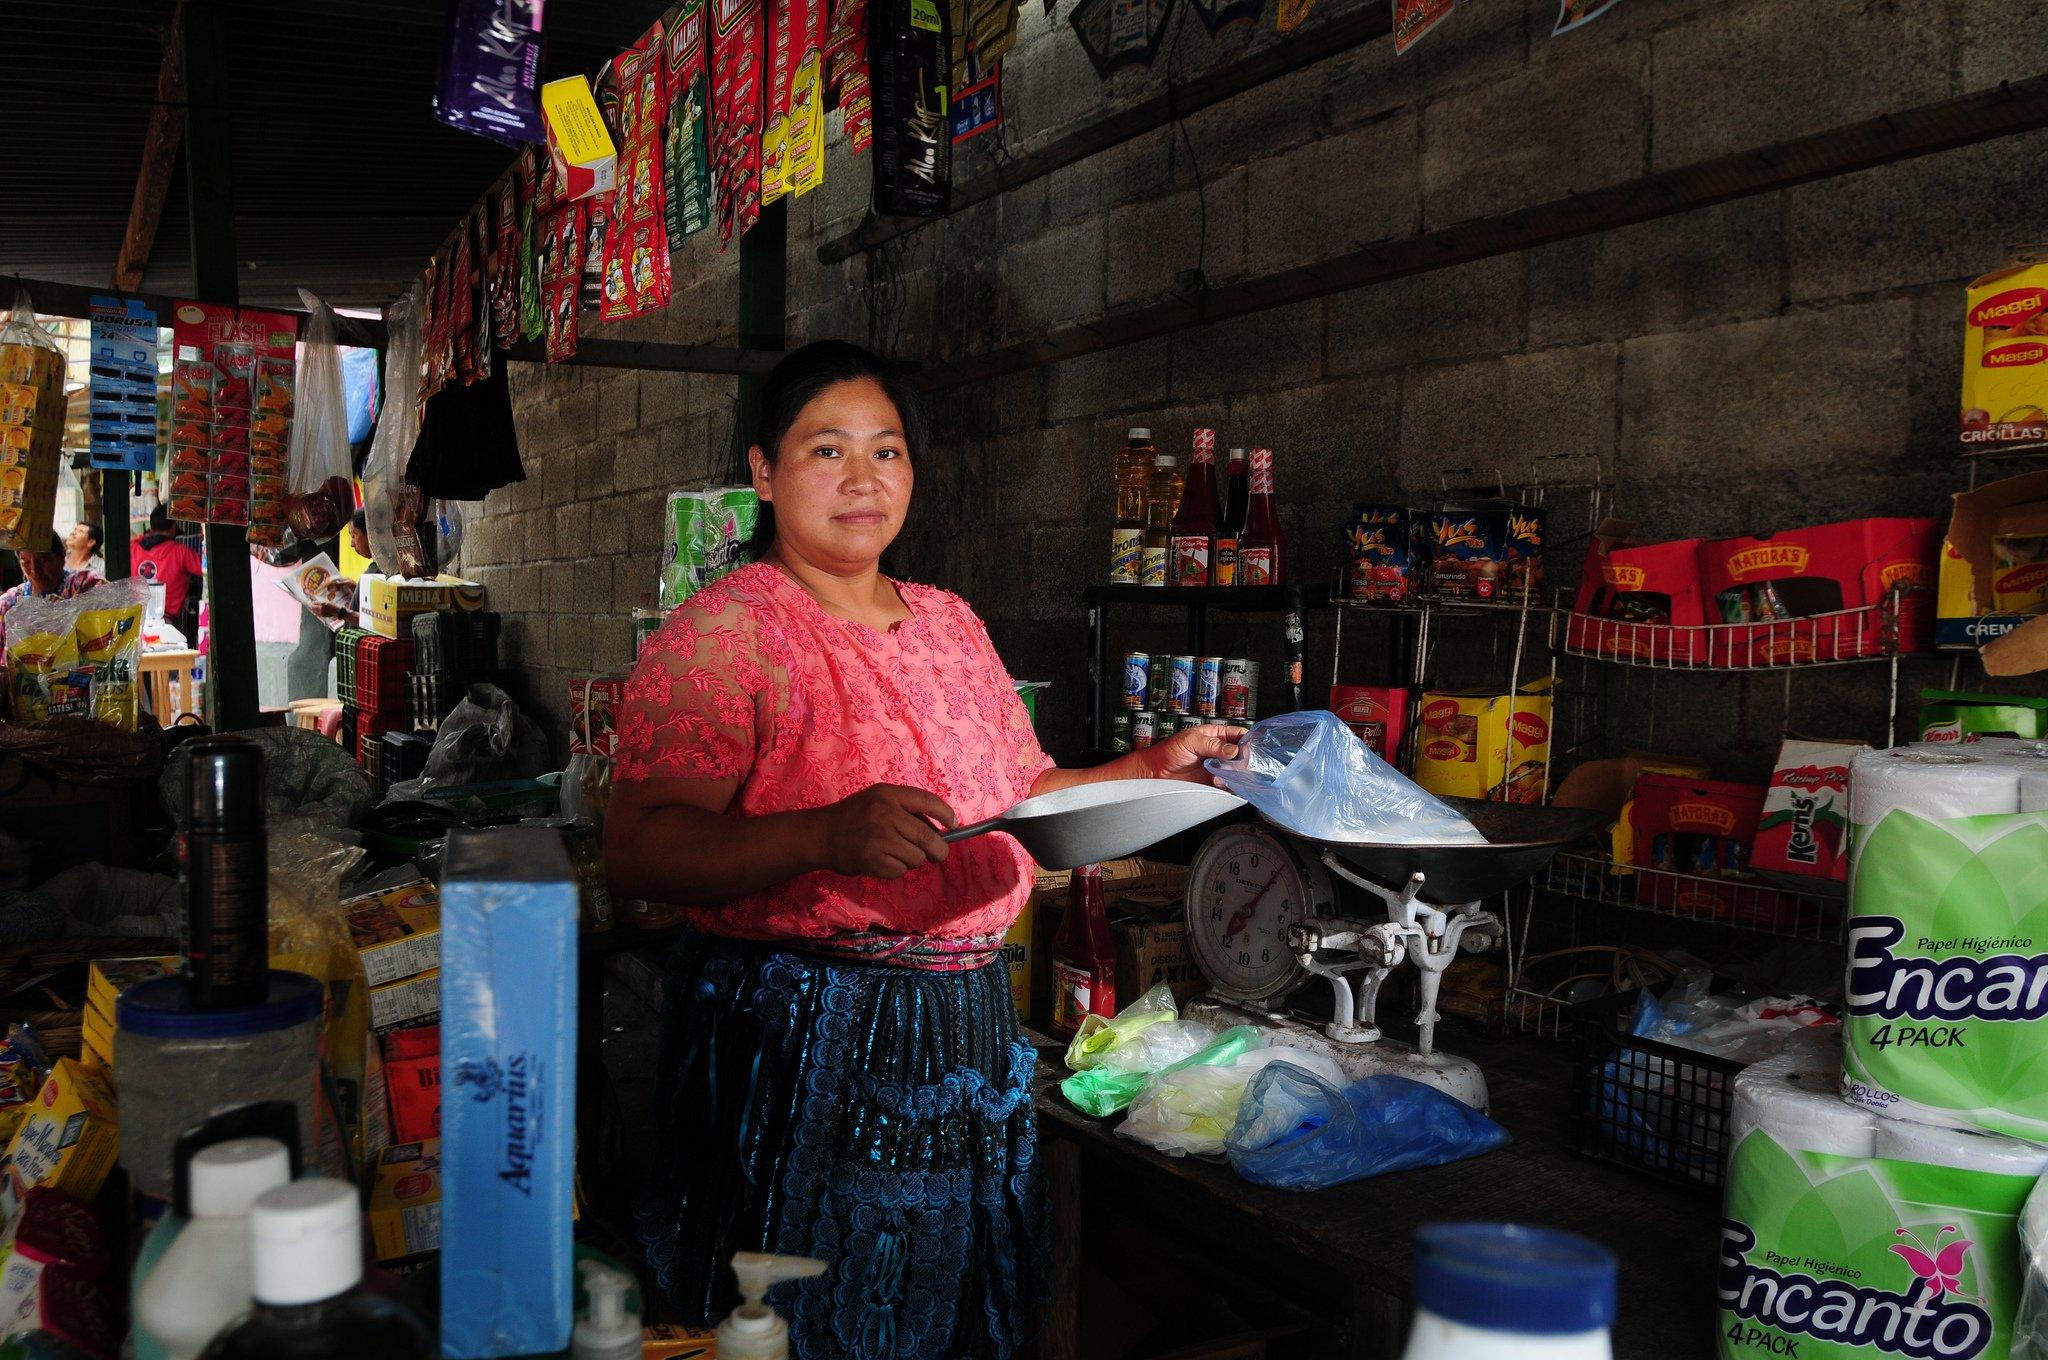 A woman works at the market, Guatemala city, Guatemala. Photo: Maria Fleischmann / World Bank CC BY-NC-ND 2.0